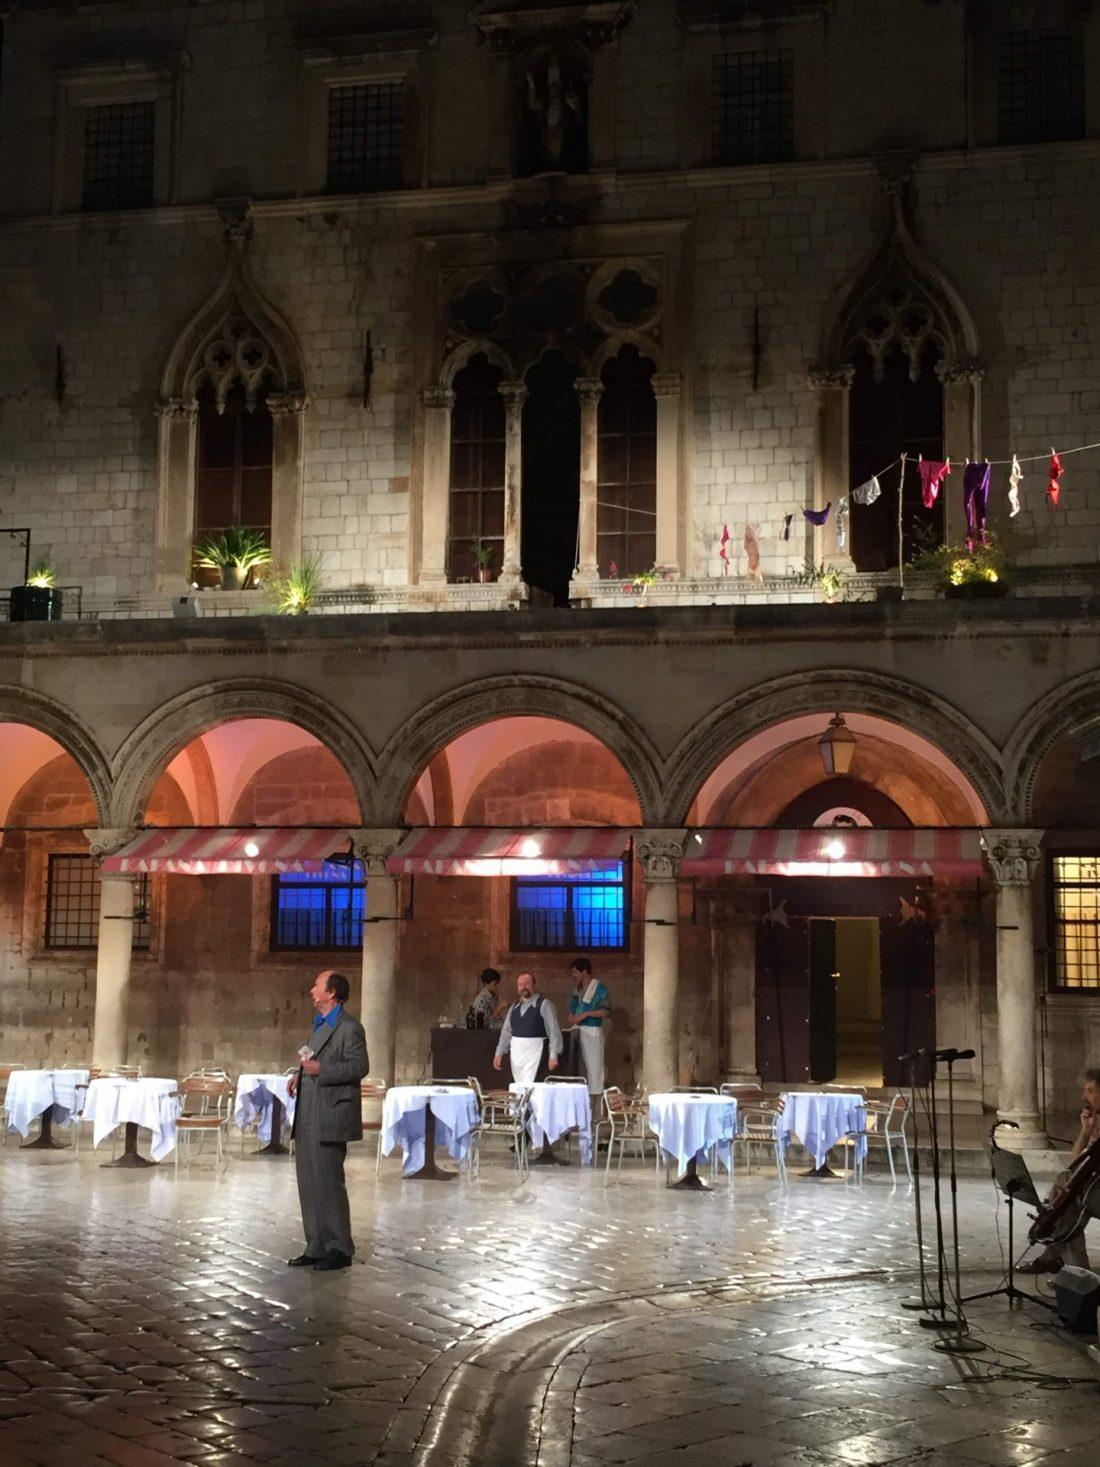 Entertainment in Dubrovnik plaza